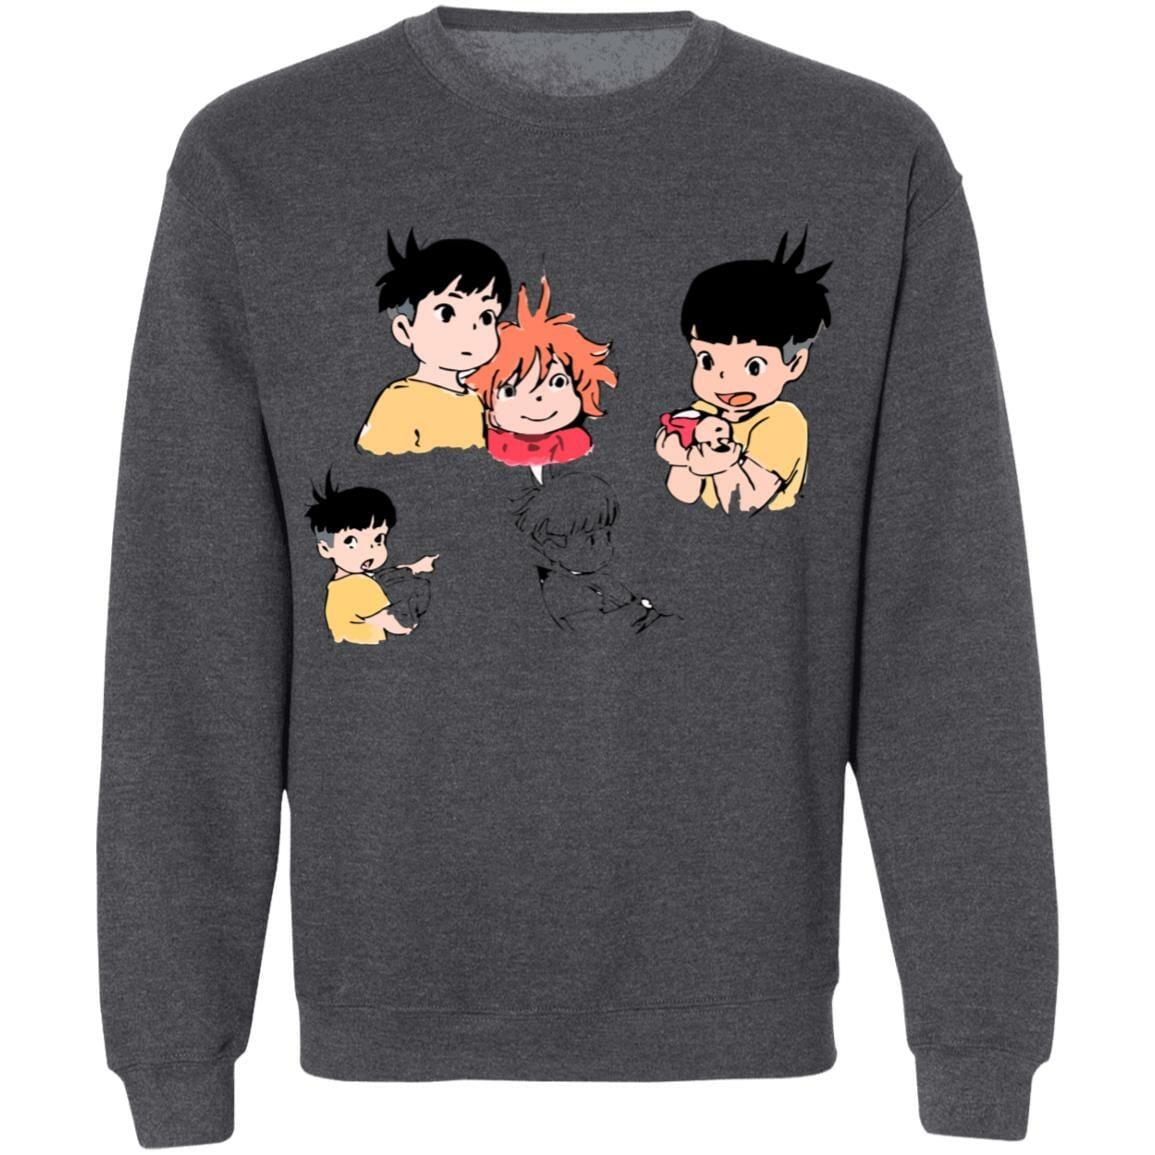 Ponyo and Sosuke Sketch Sweatshirt